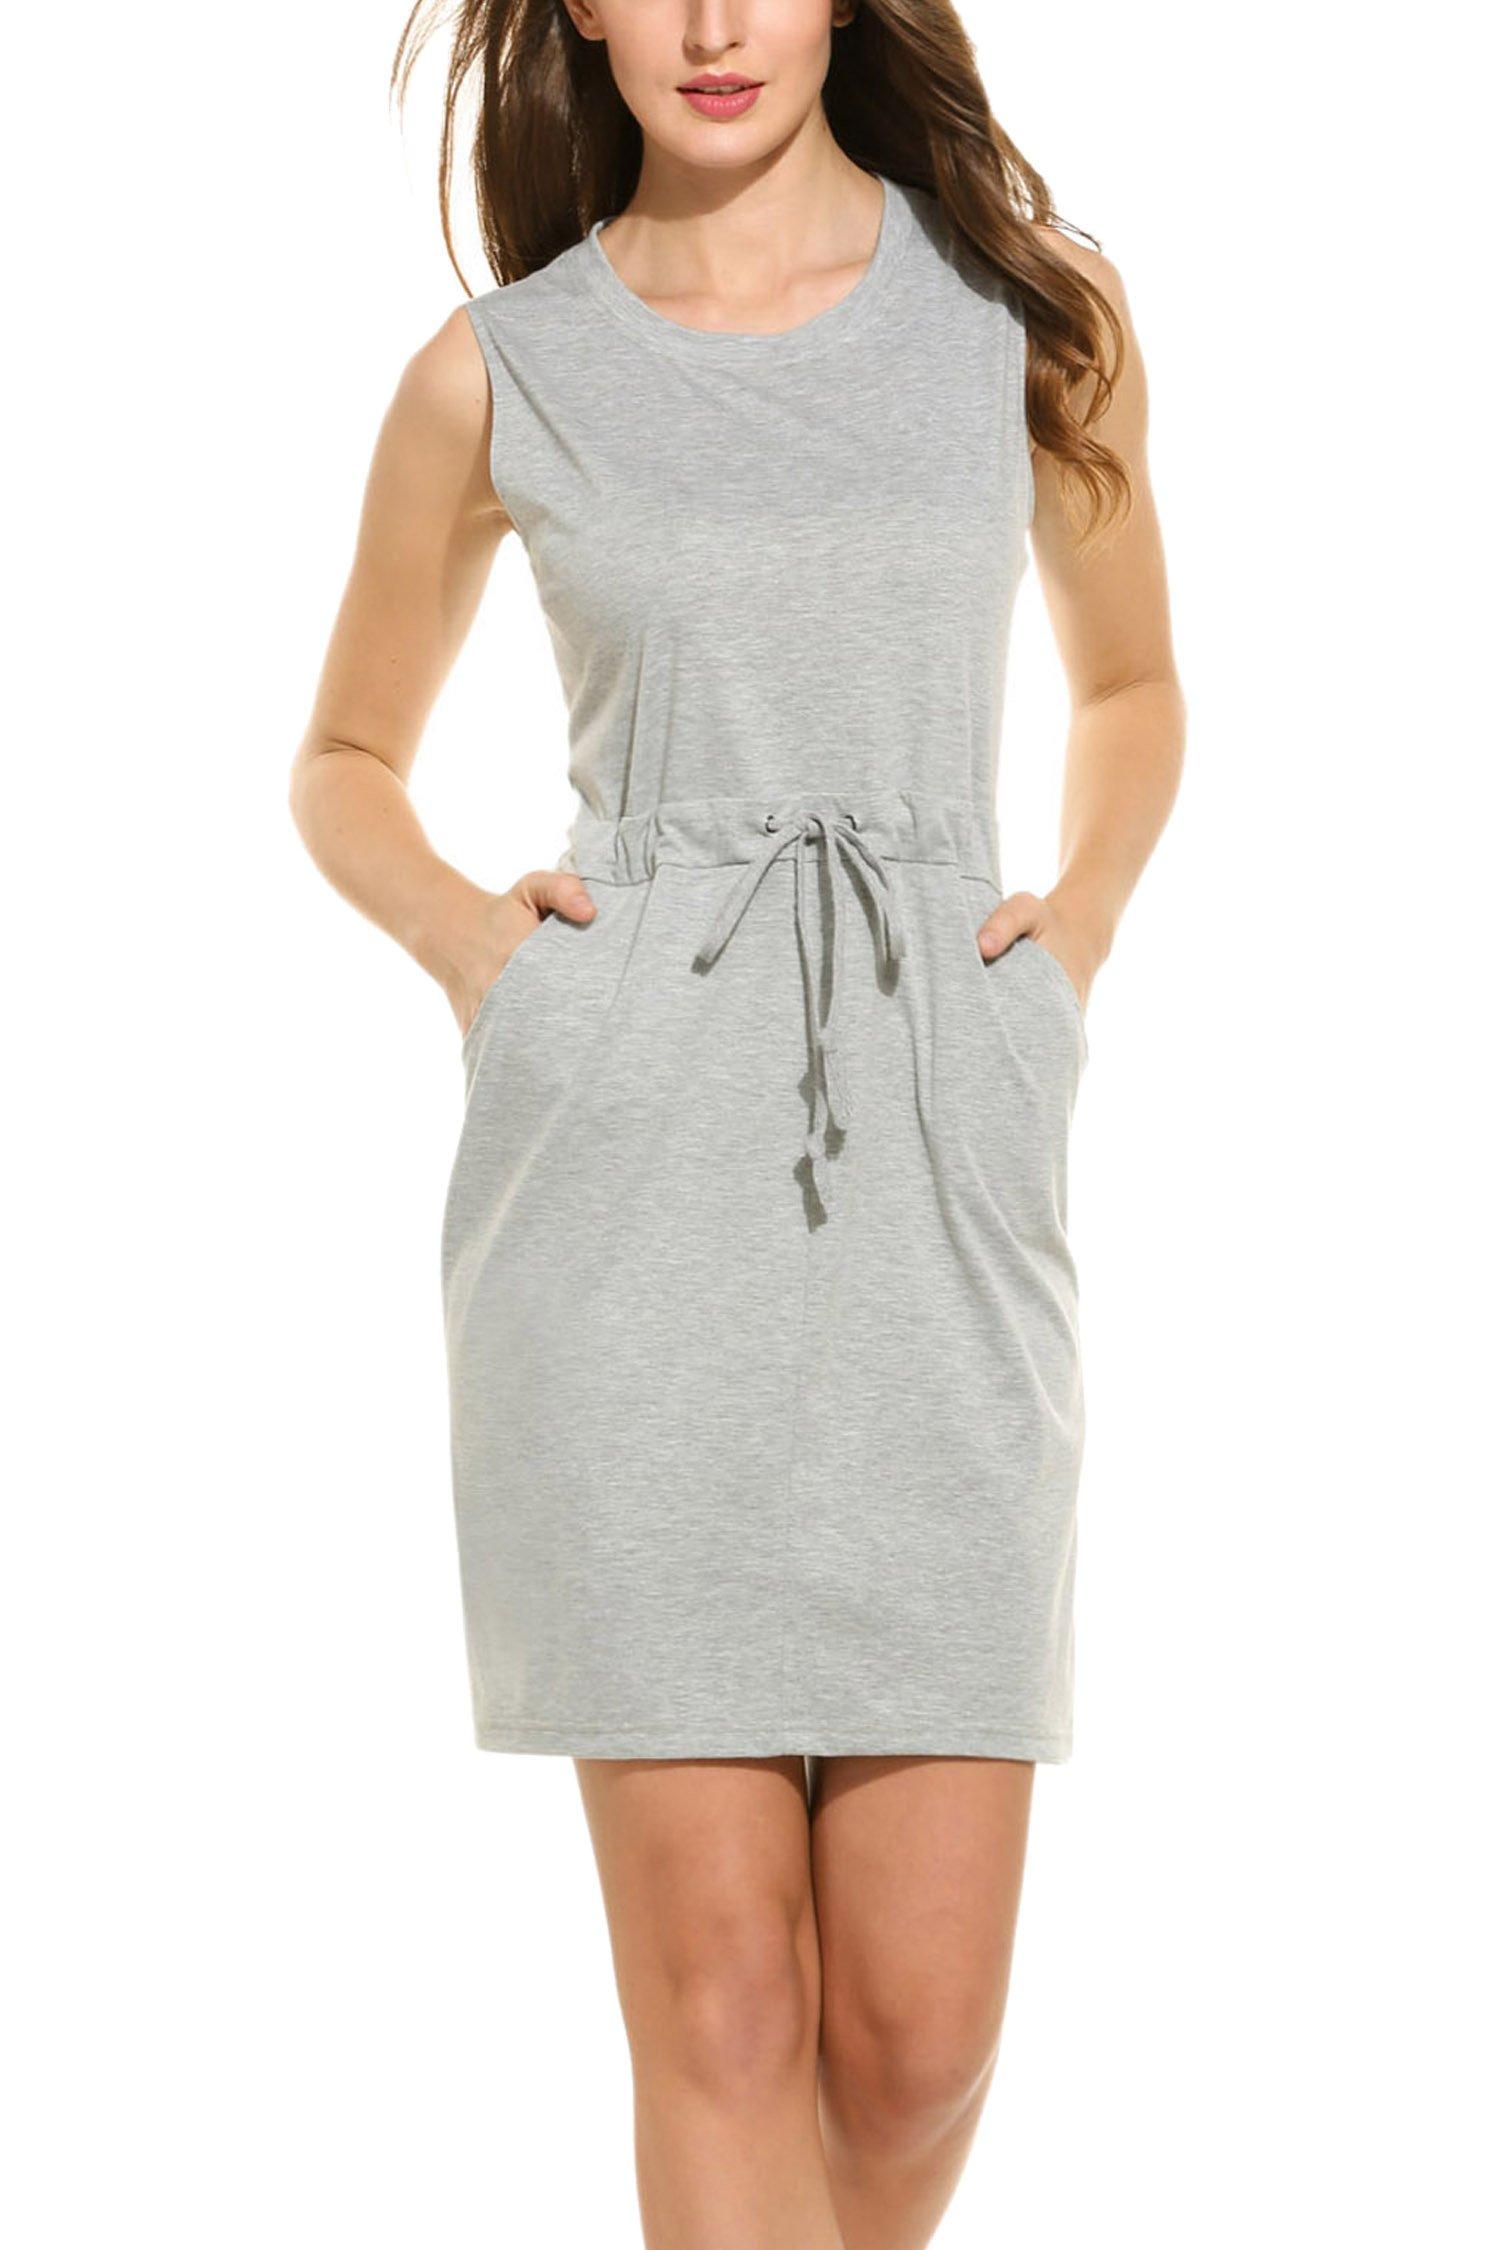 SE MIU Women's Pockets Drawstring Sleeveless Above Knee Dress